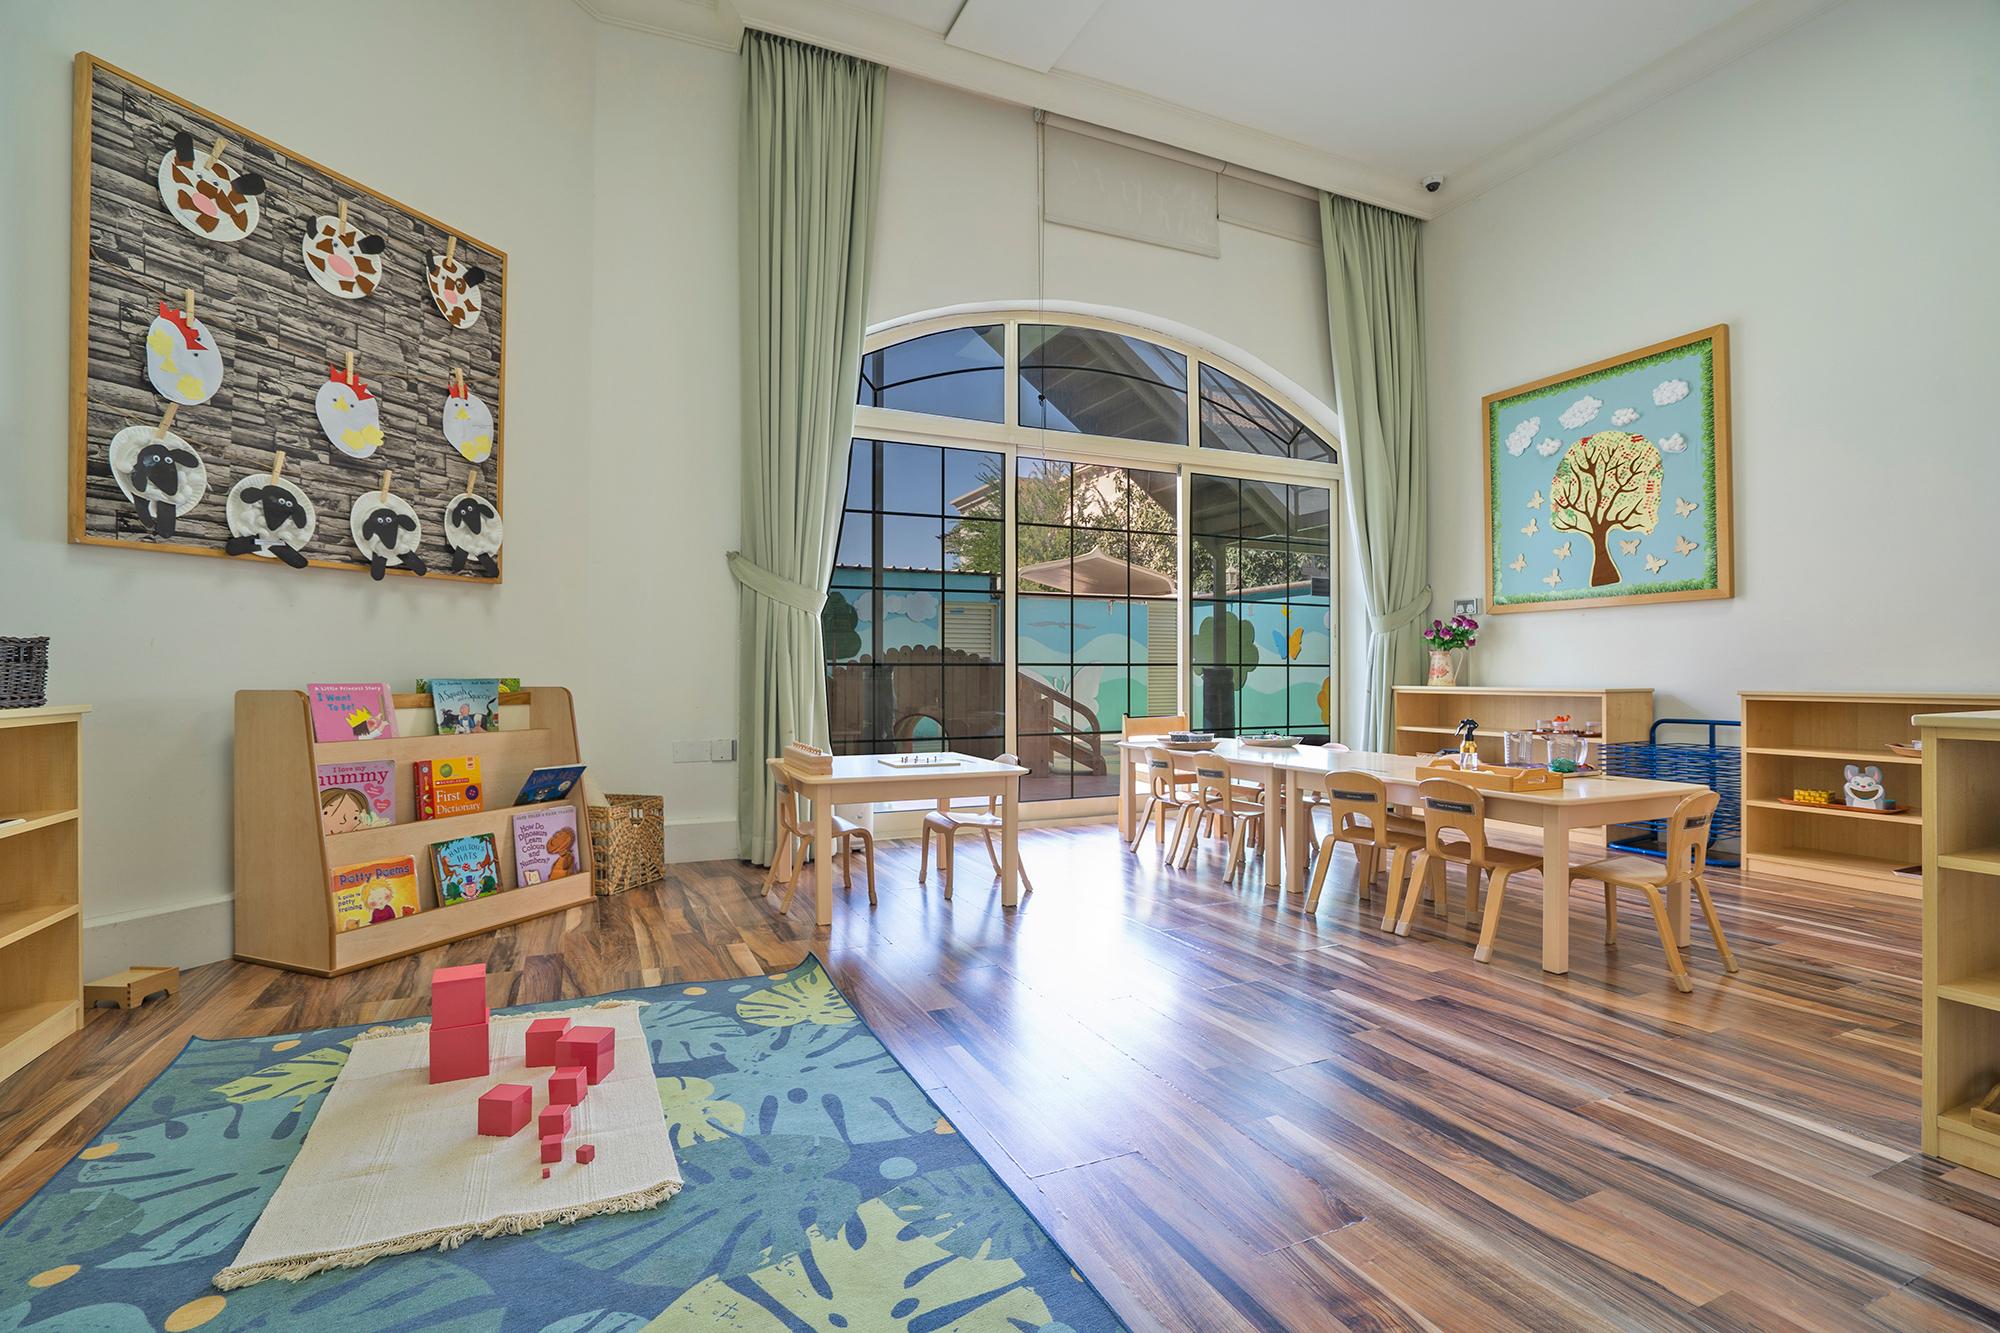 RWN Khalifa Classroom 6